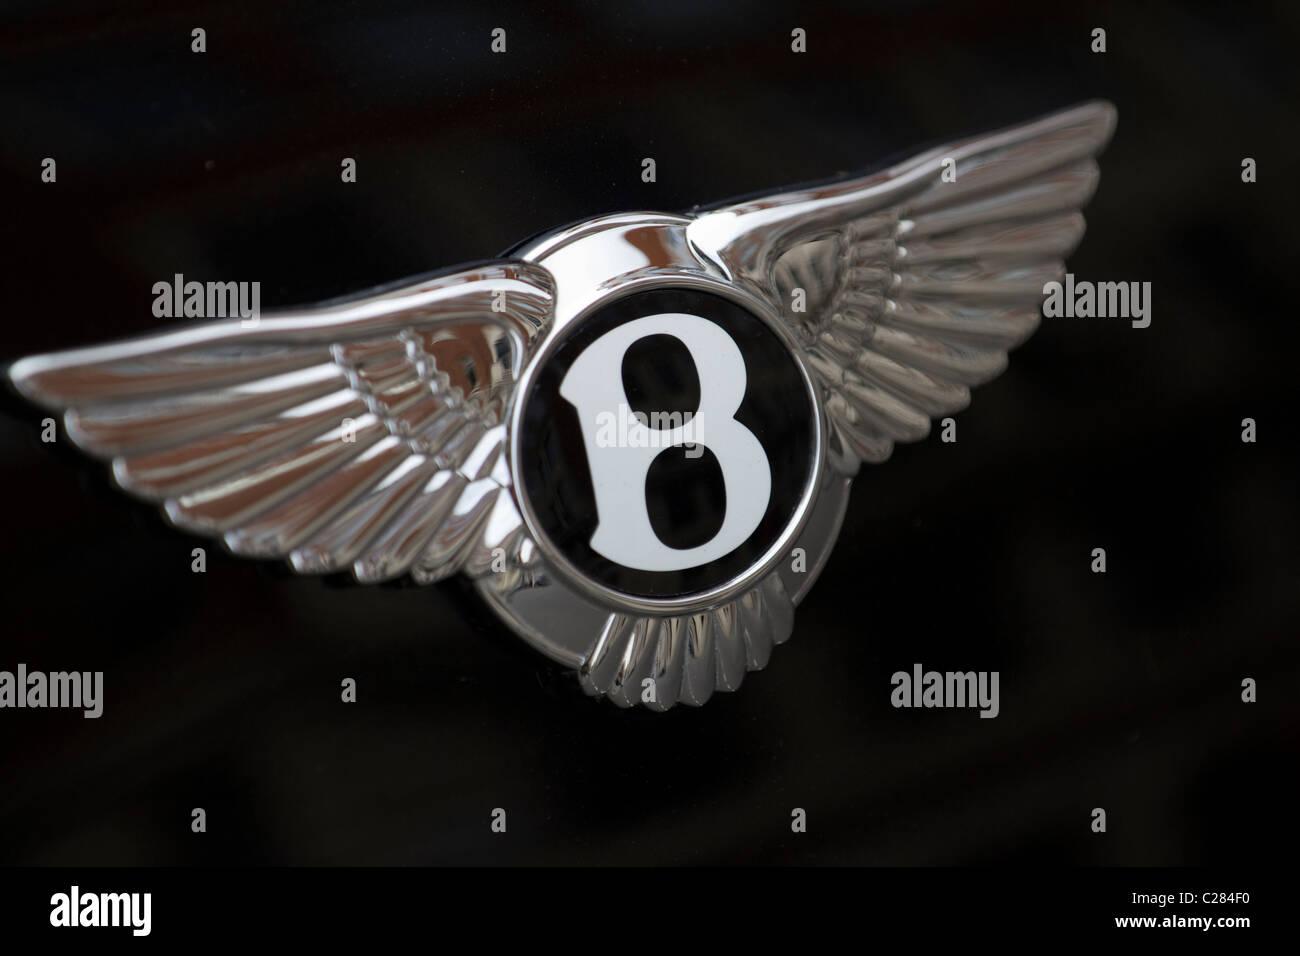 Bentley car badge - Stock Image